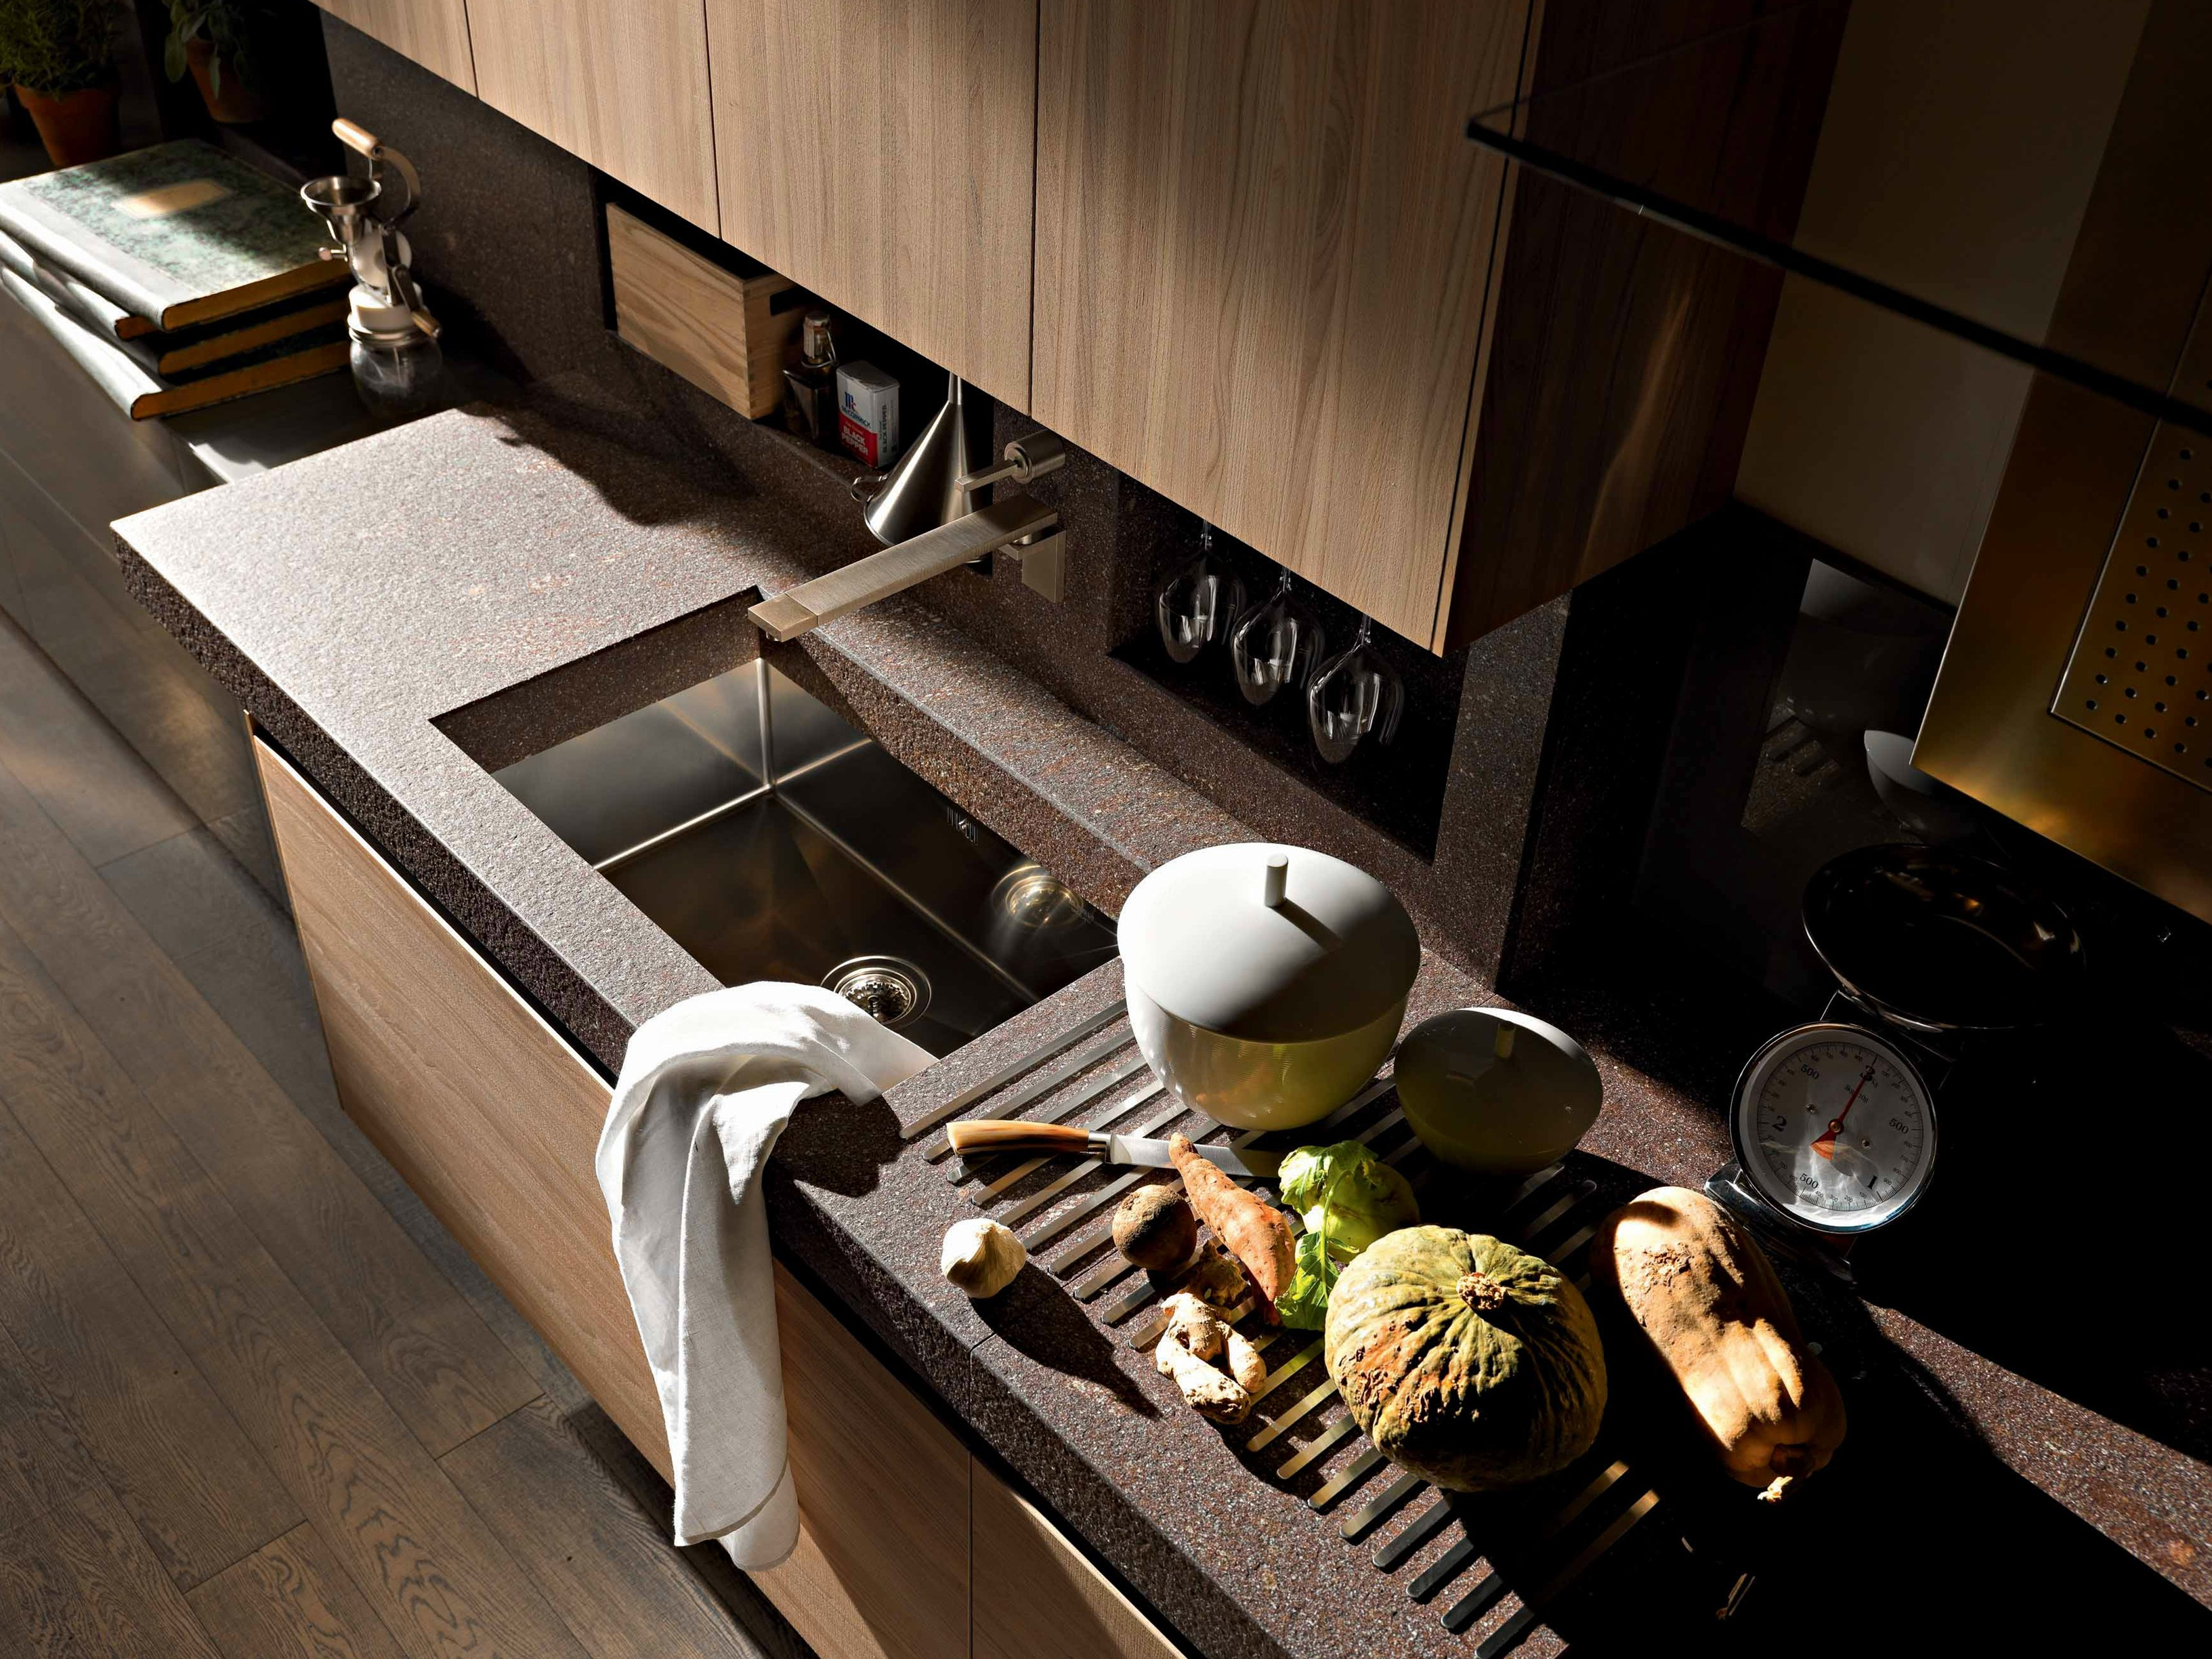 Cucina Mobili Cucina E Complementi Cucine #A0932B 3266 2449 Altezza Mobili Cucina Componibile